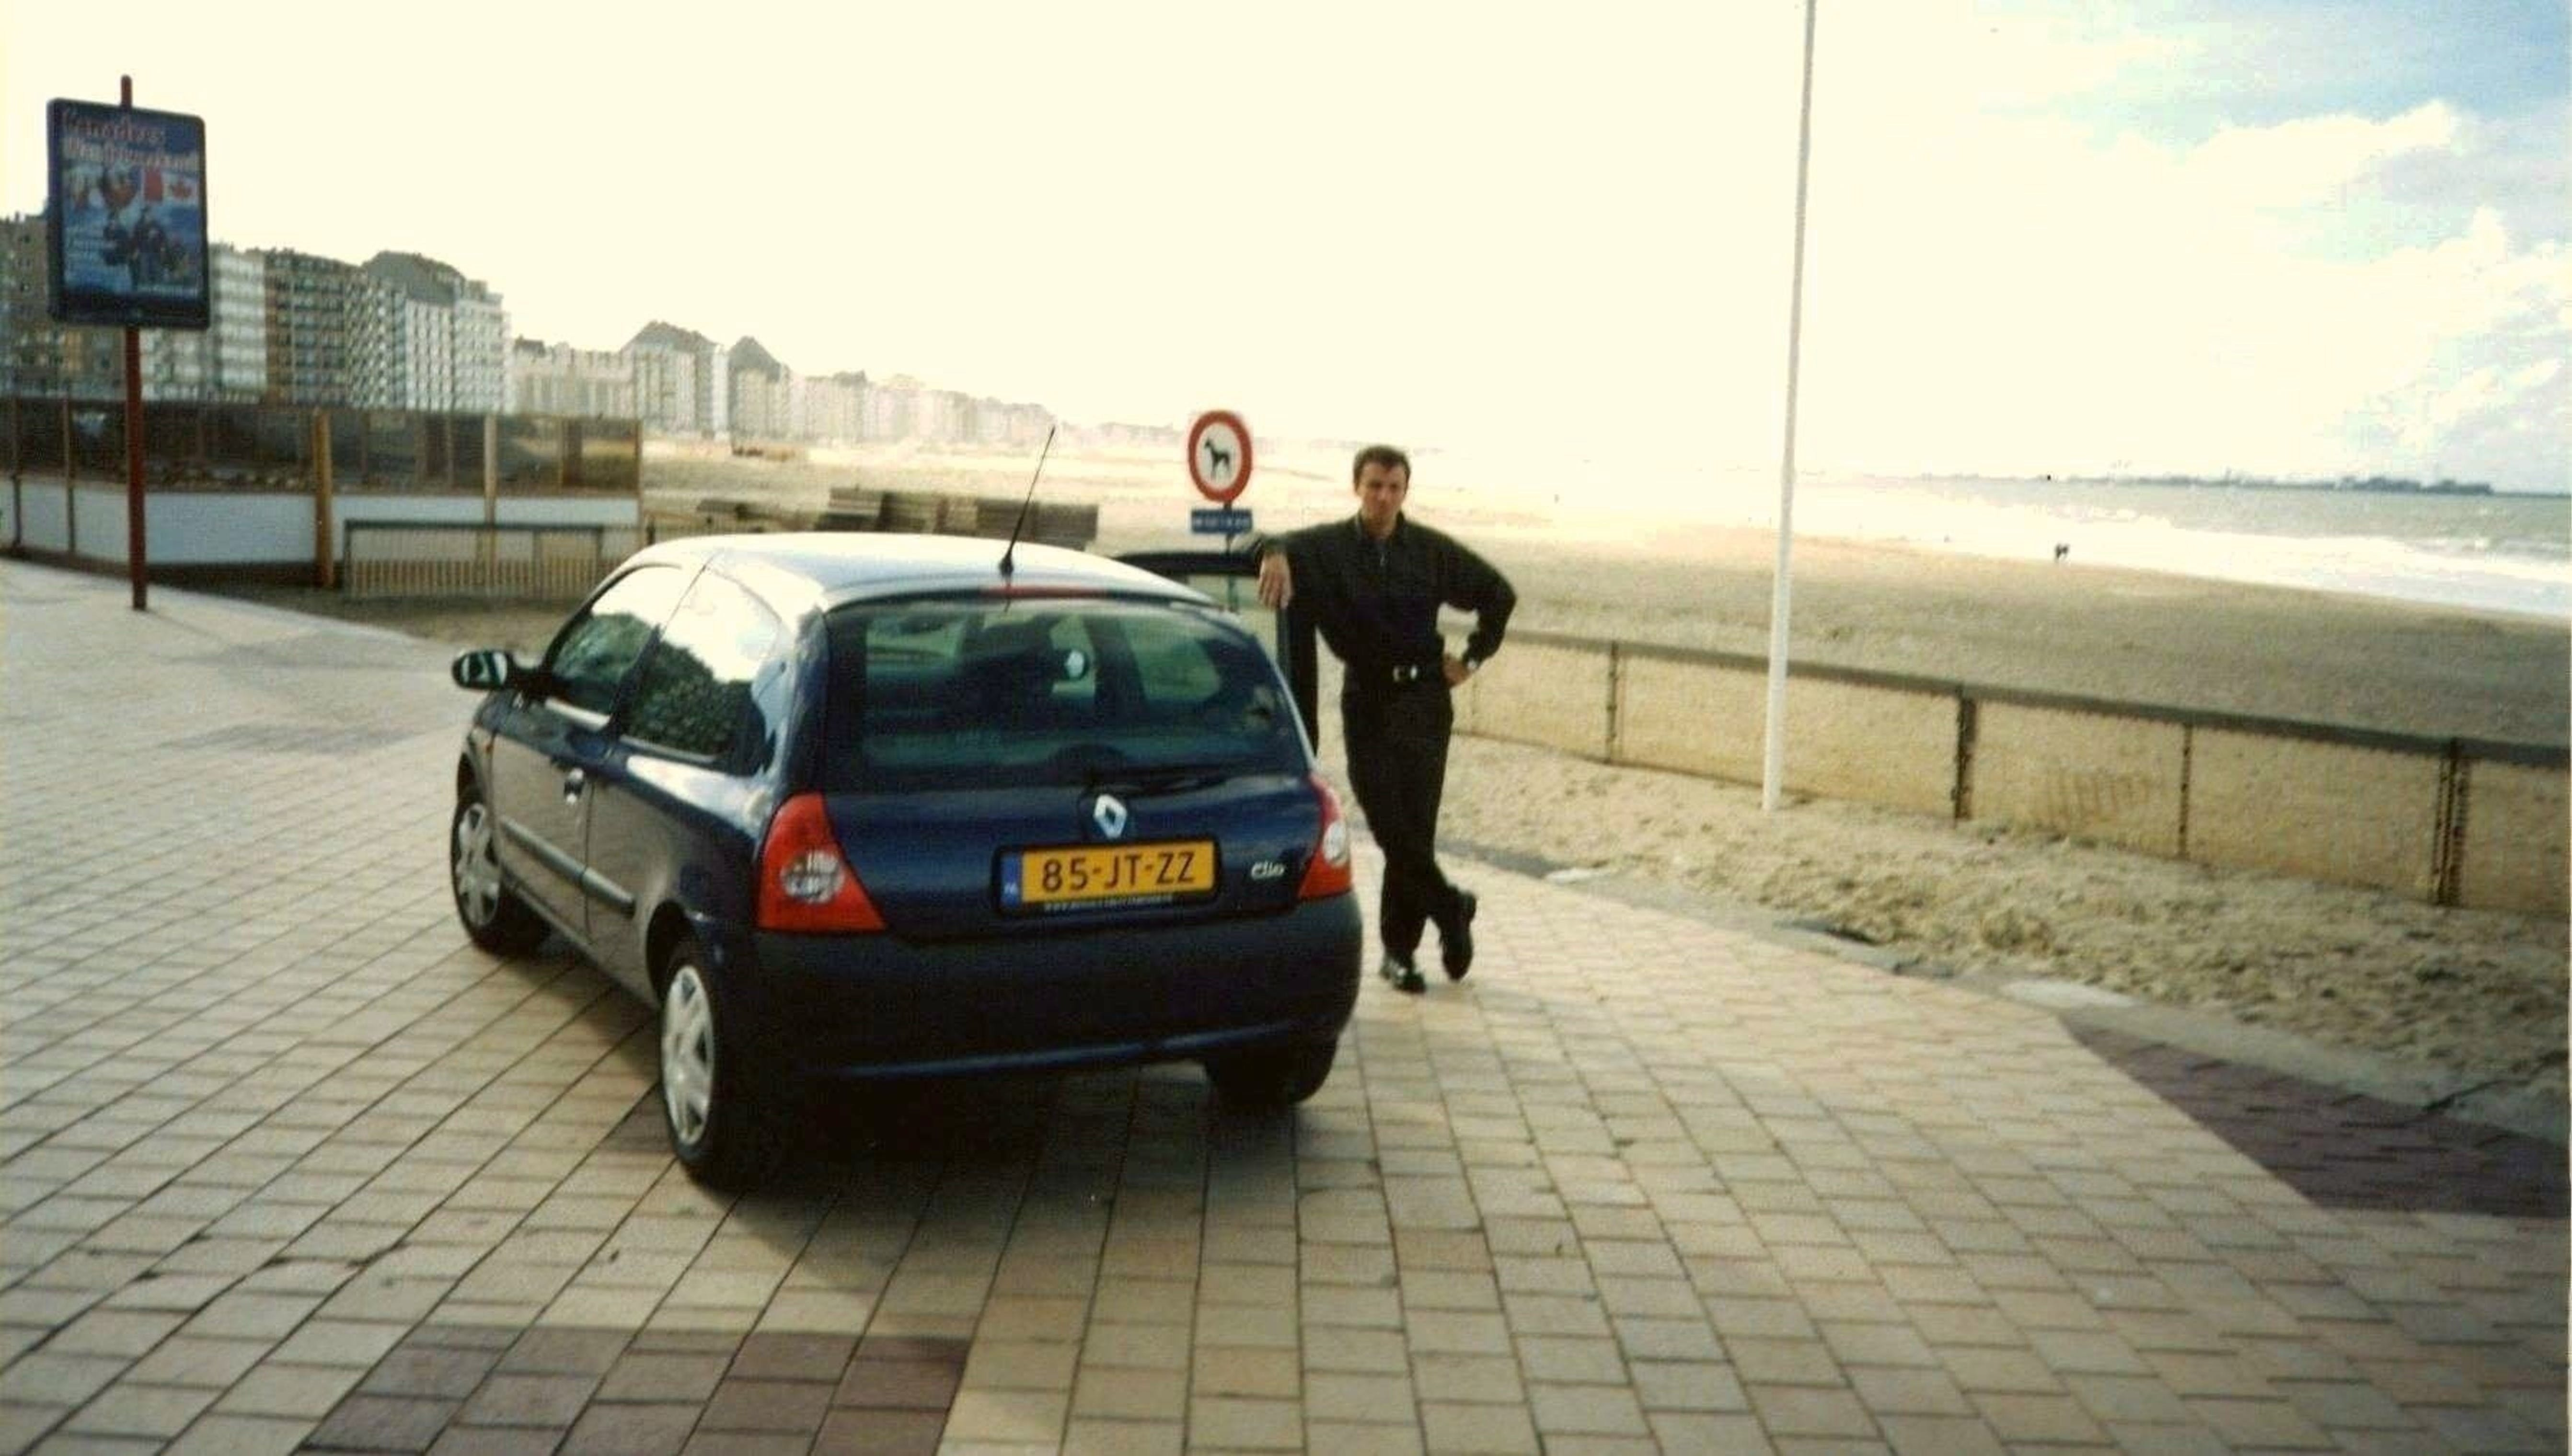 Free stock photo of Belgium, België, Knokke-Heist